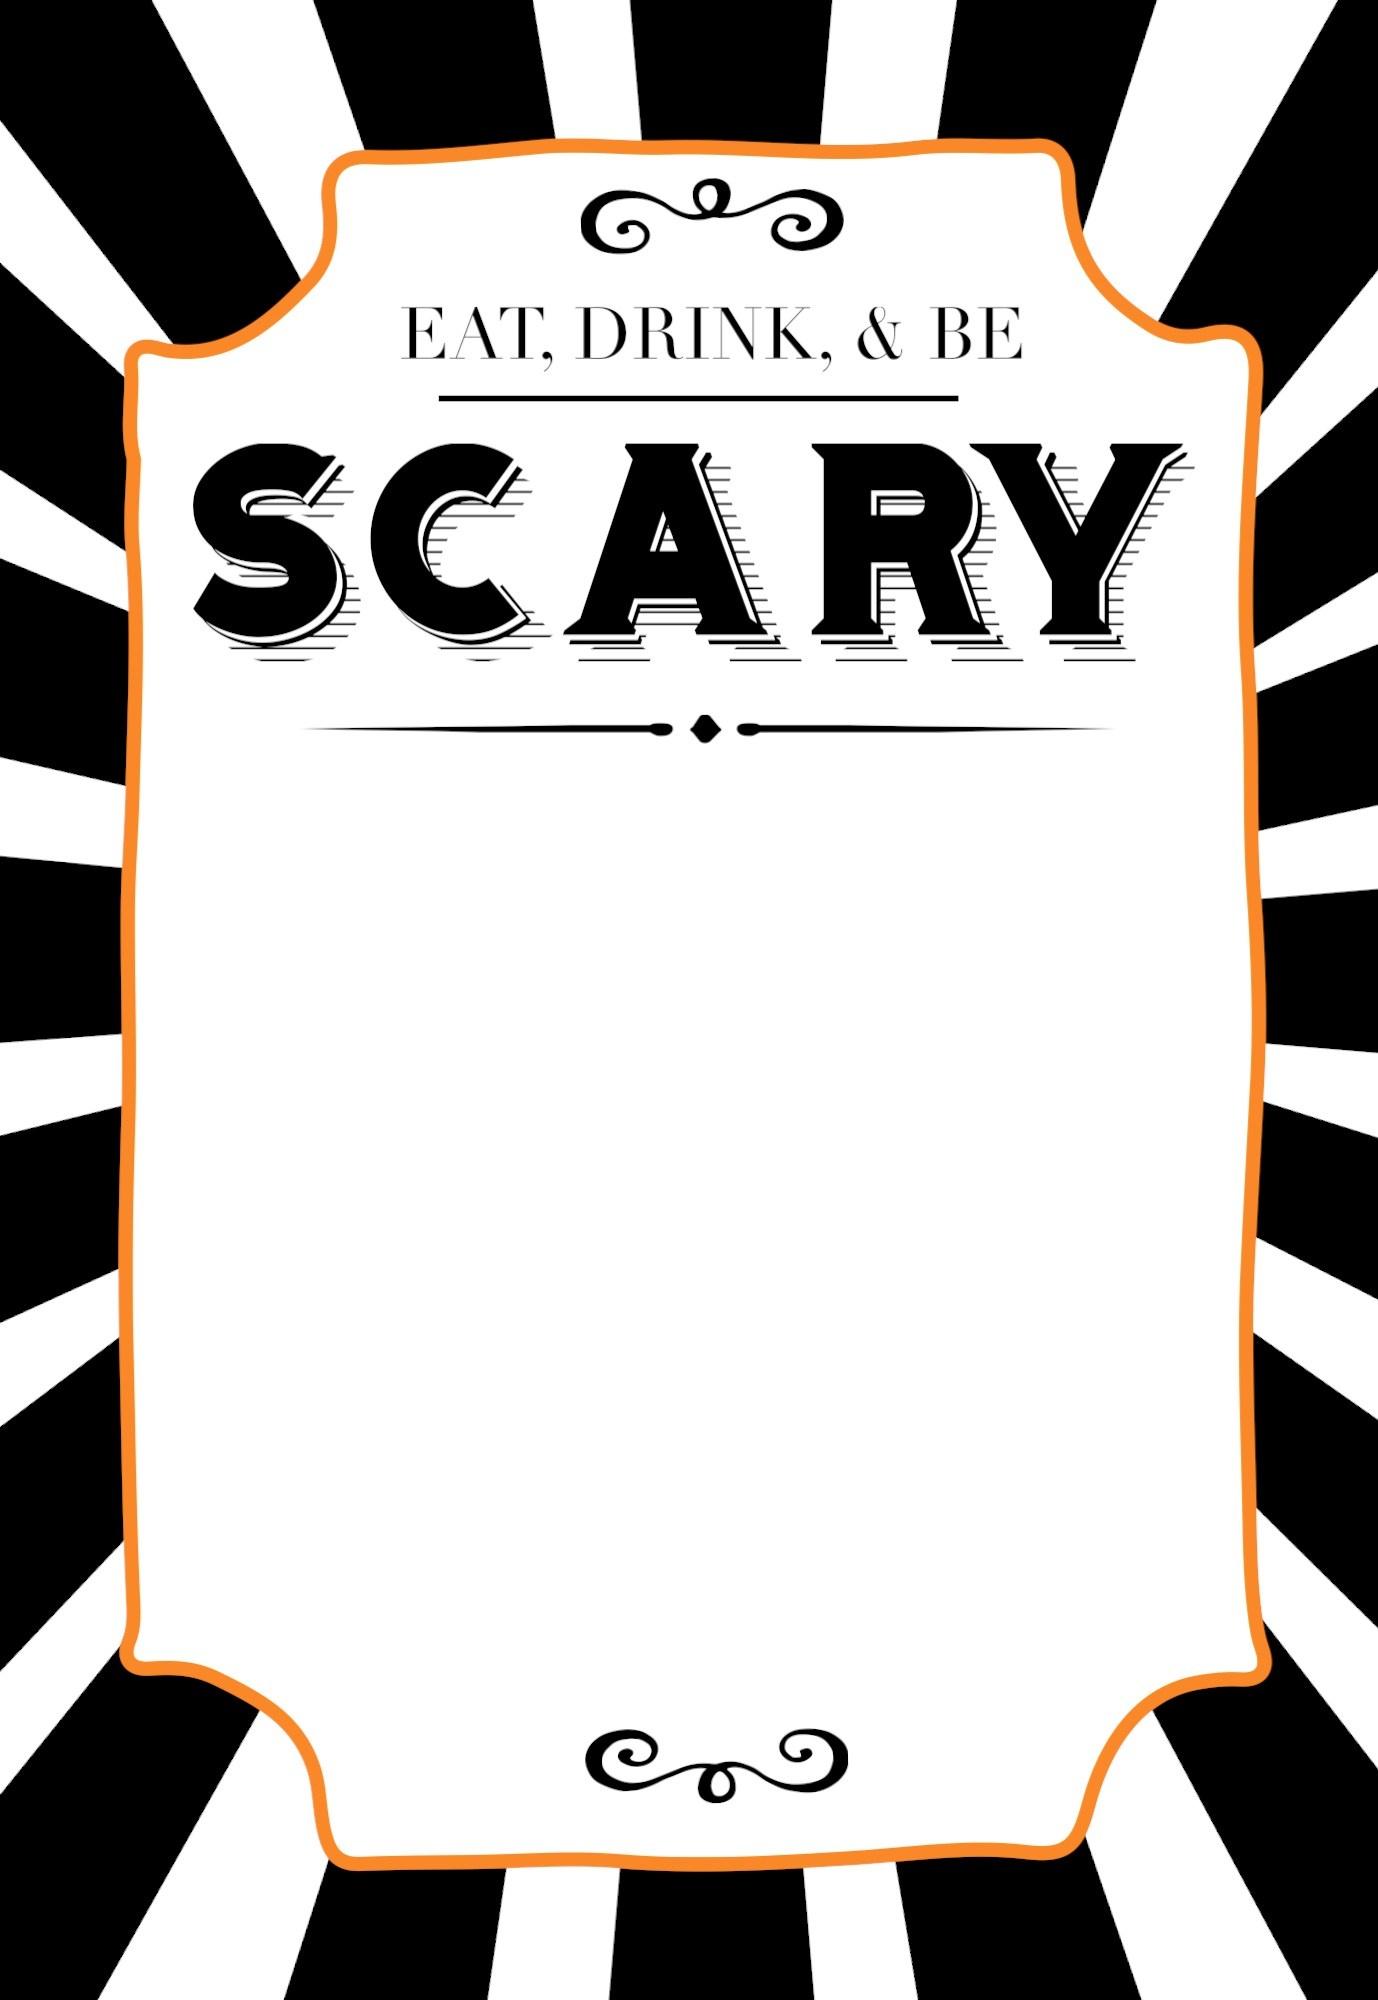 Halloween Invitations Free Printable Template - Paper Trail Design - Free Halloween Birthday Invitation Templates Printable